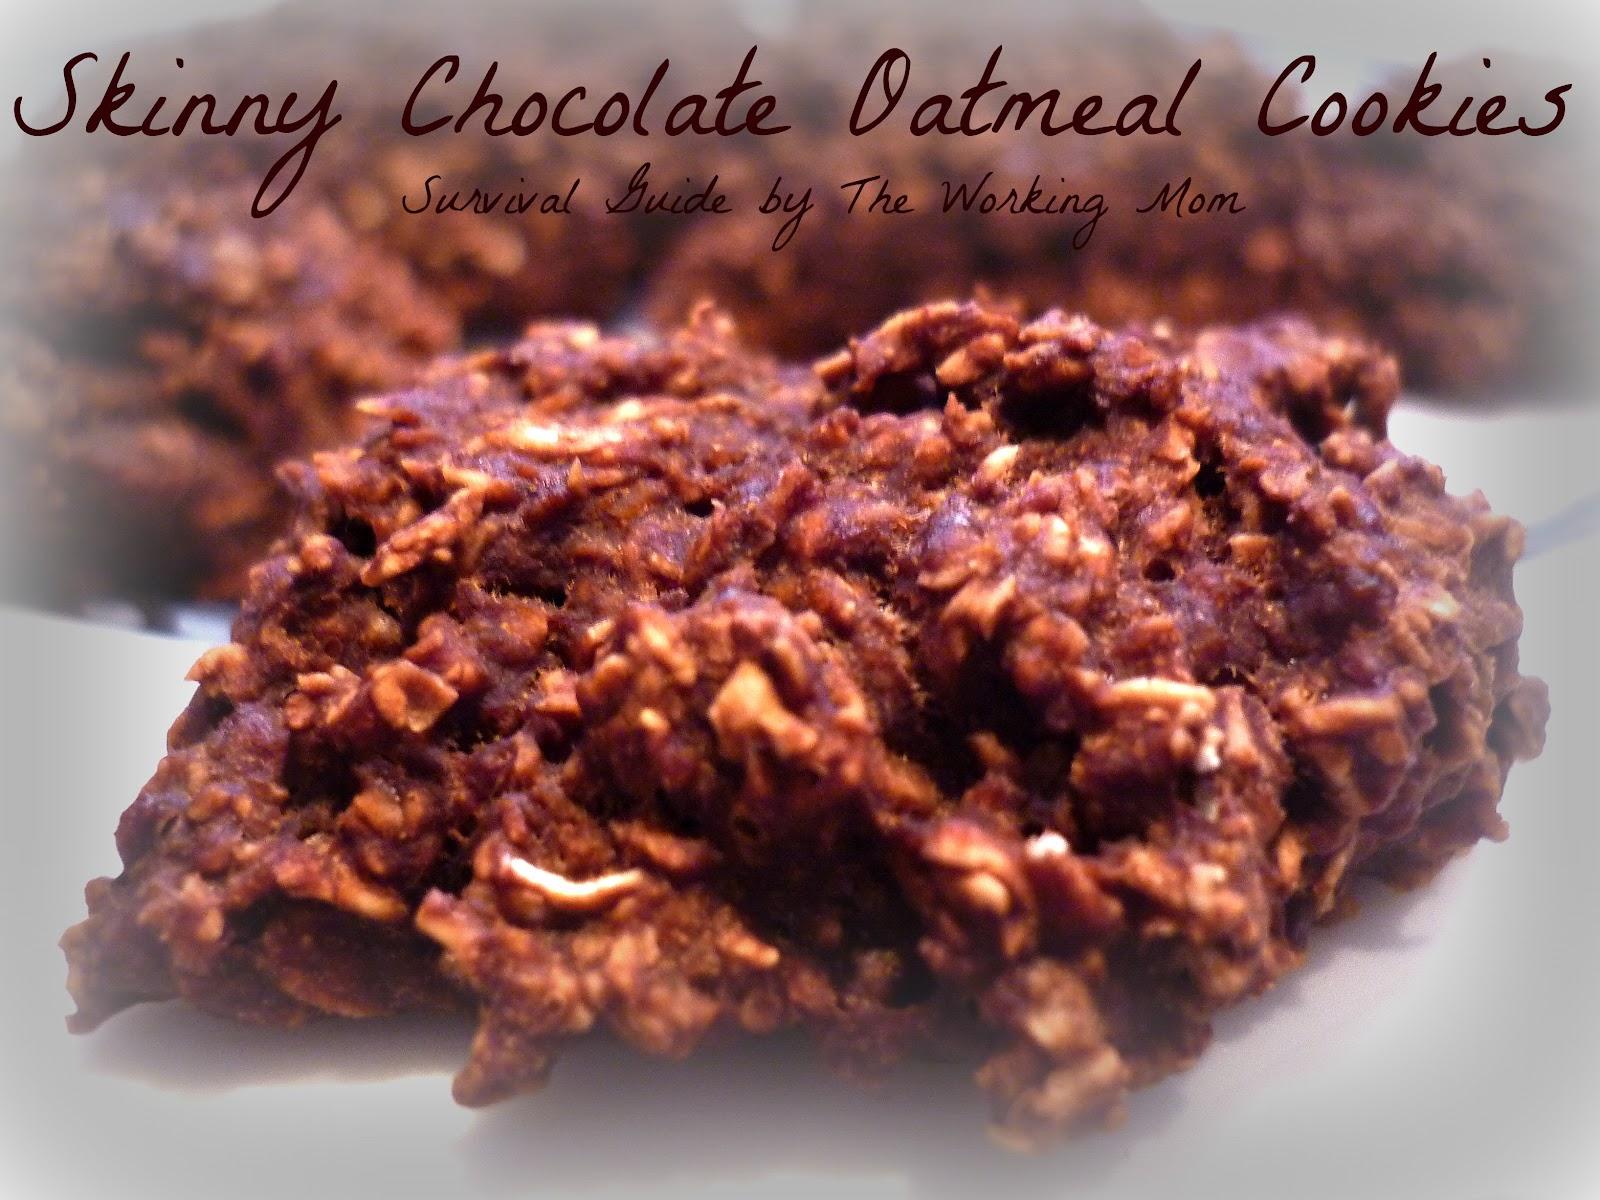 Skinny Chocolate Oatmeal Cookies Recipe